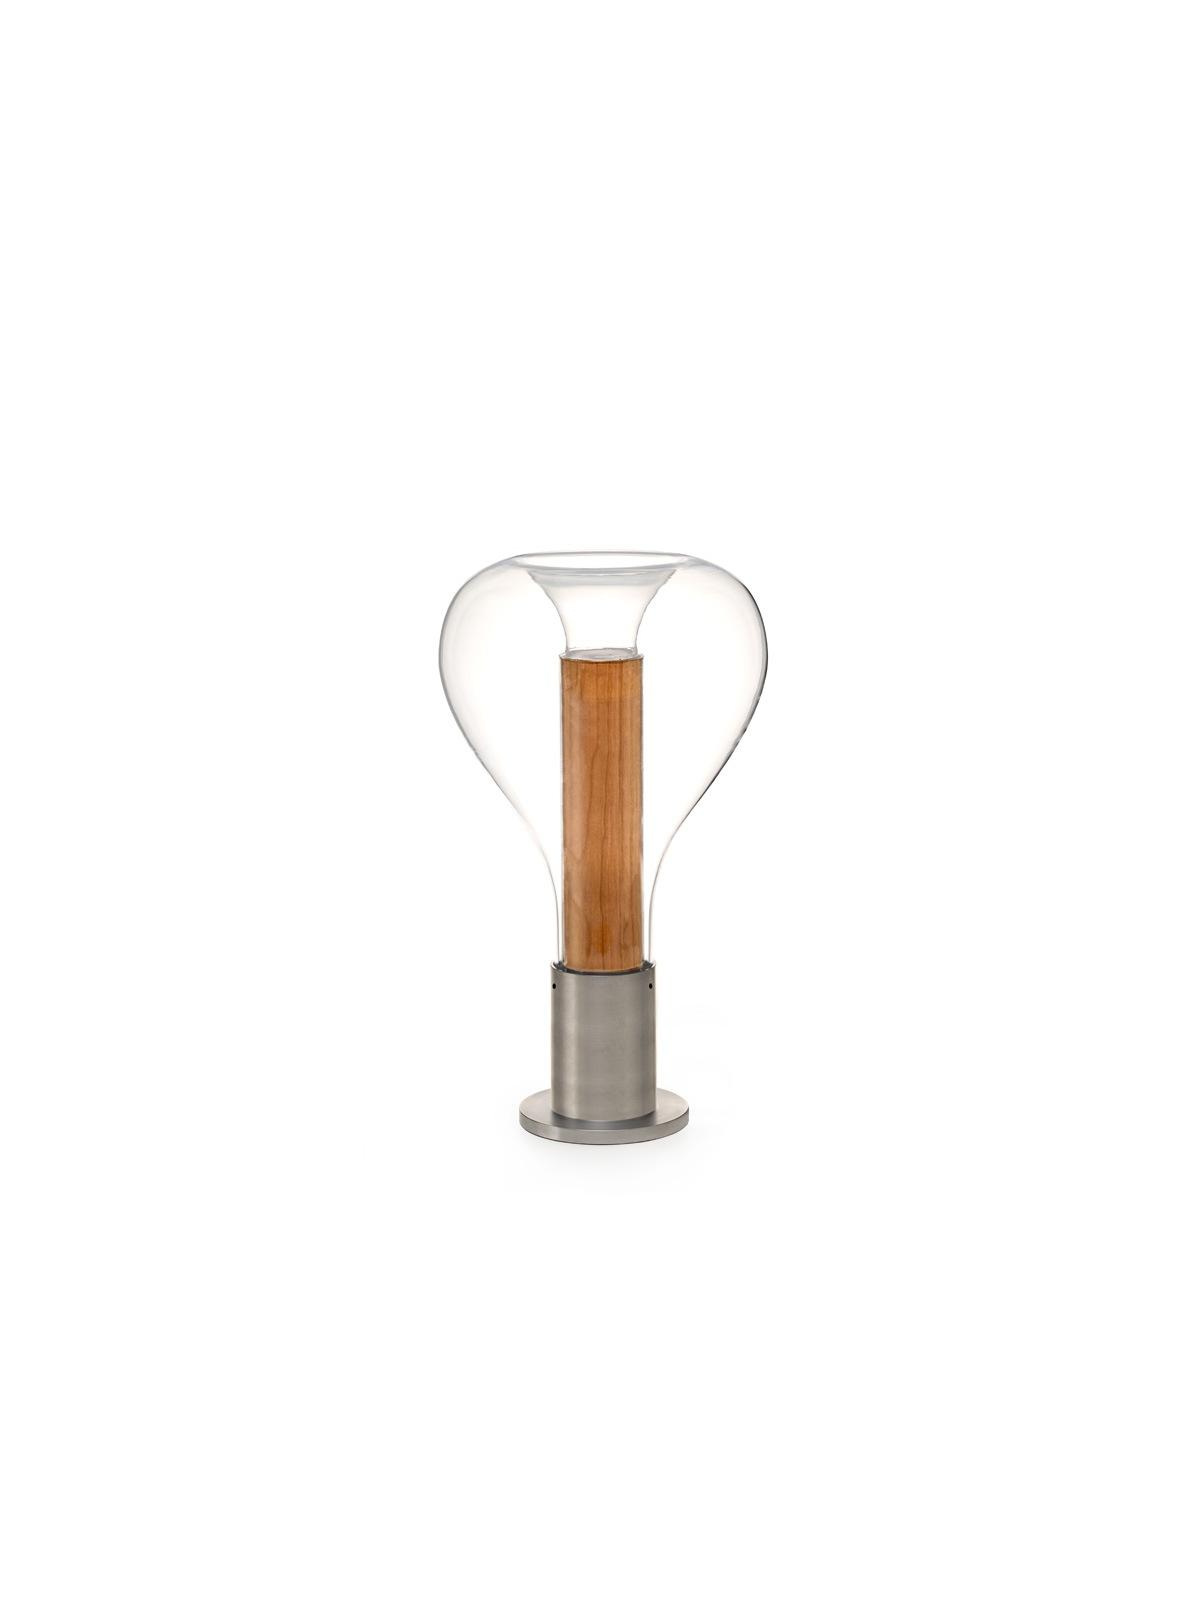 Eris M LZF Lamps Tischleuchte DesignOrt Onlineshop Lampen Berlin